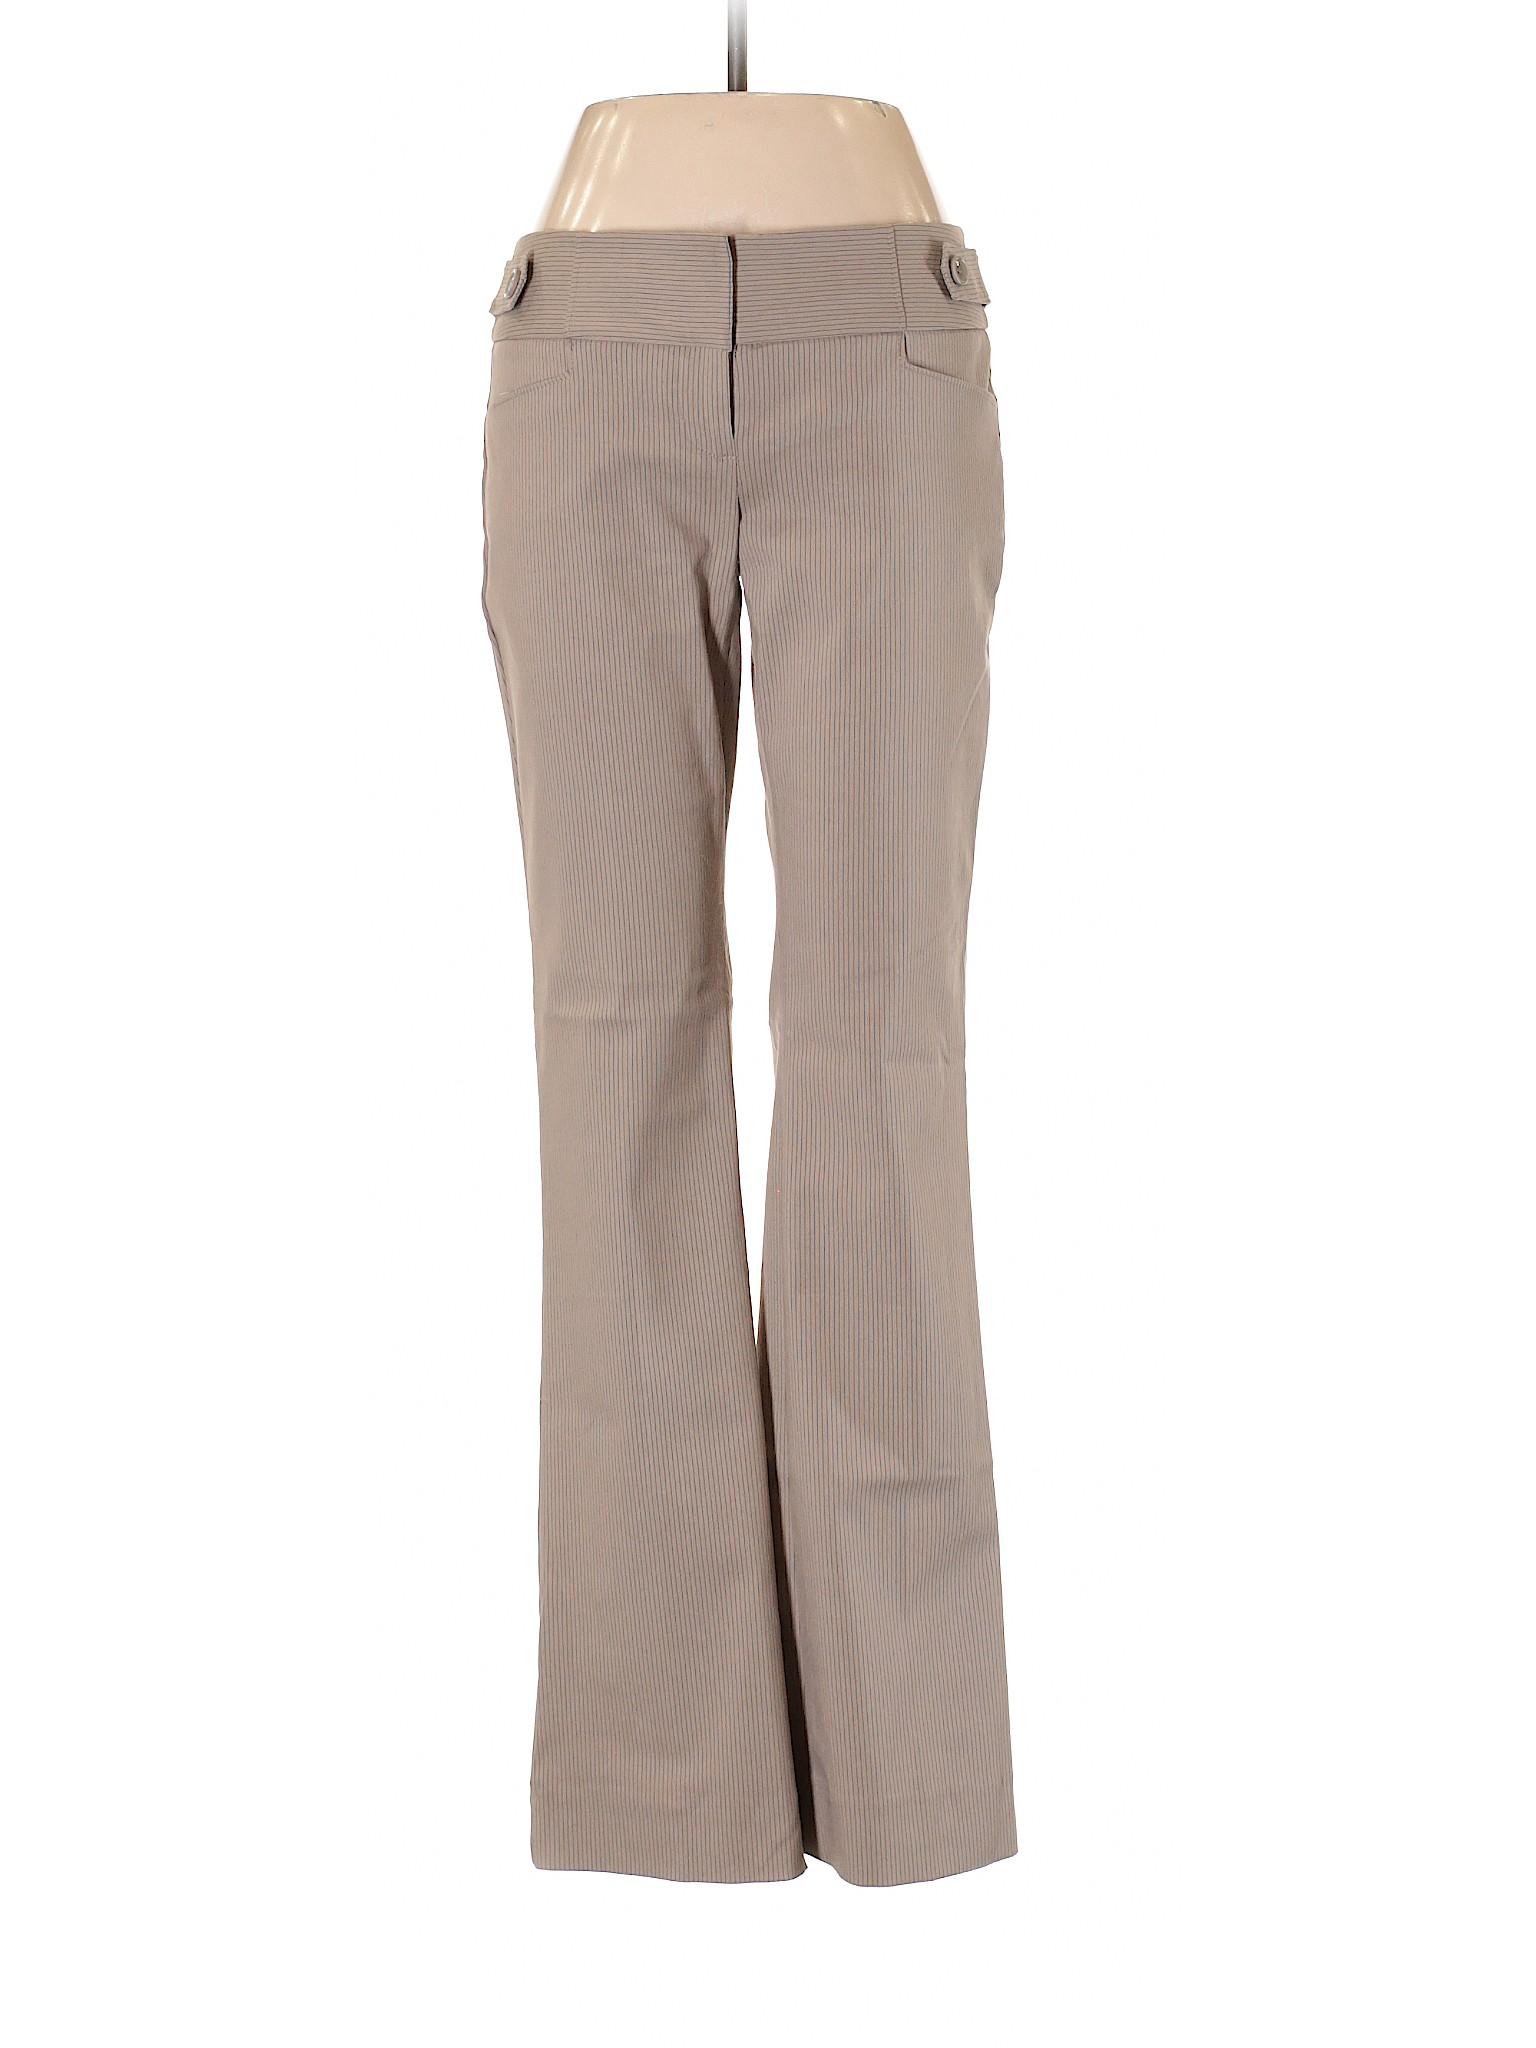 leisure Dress The Limited Pants Boutique 8dSqa8